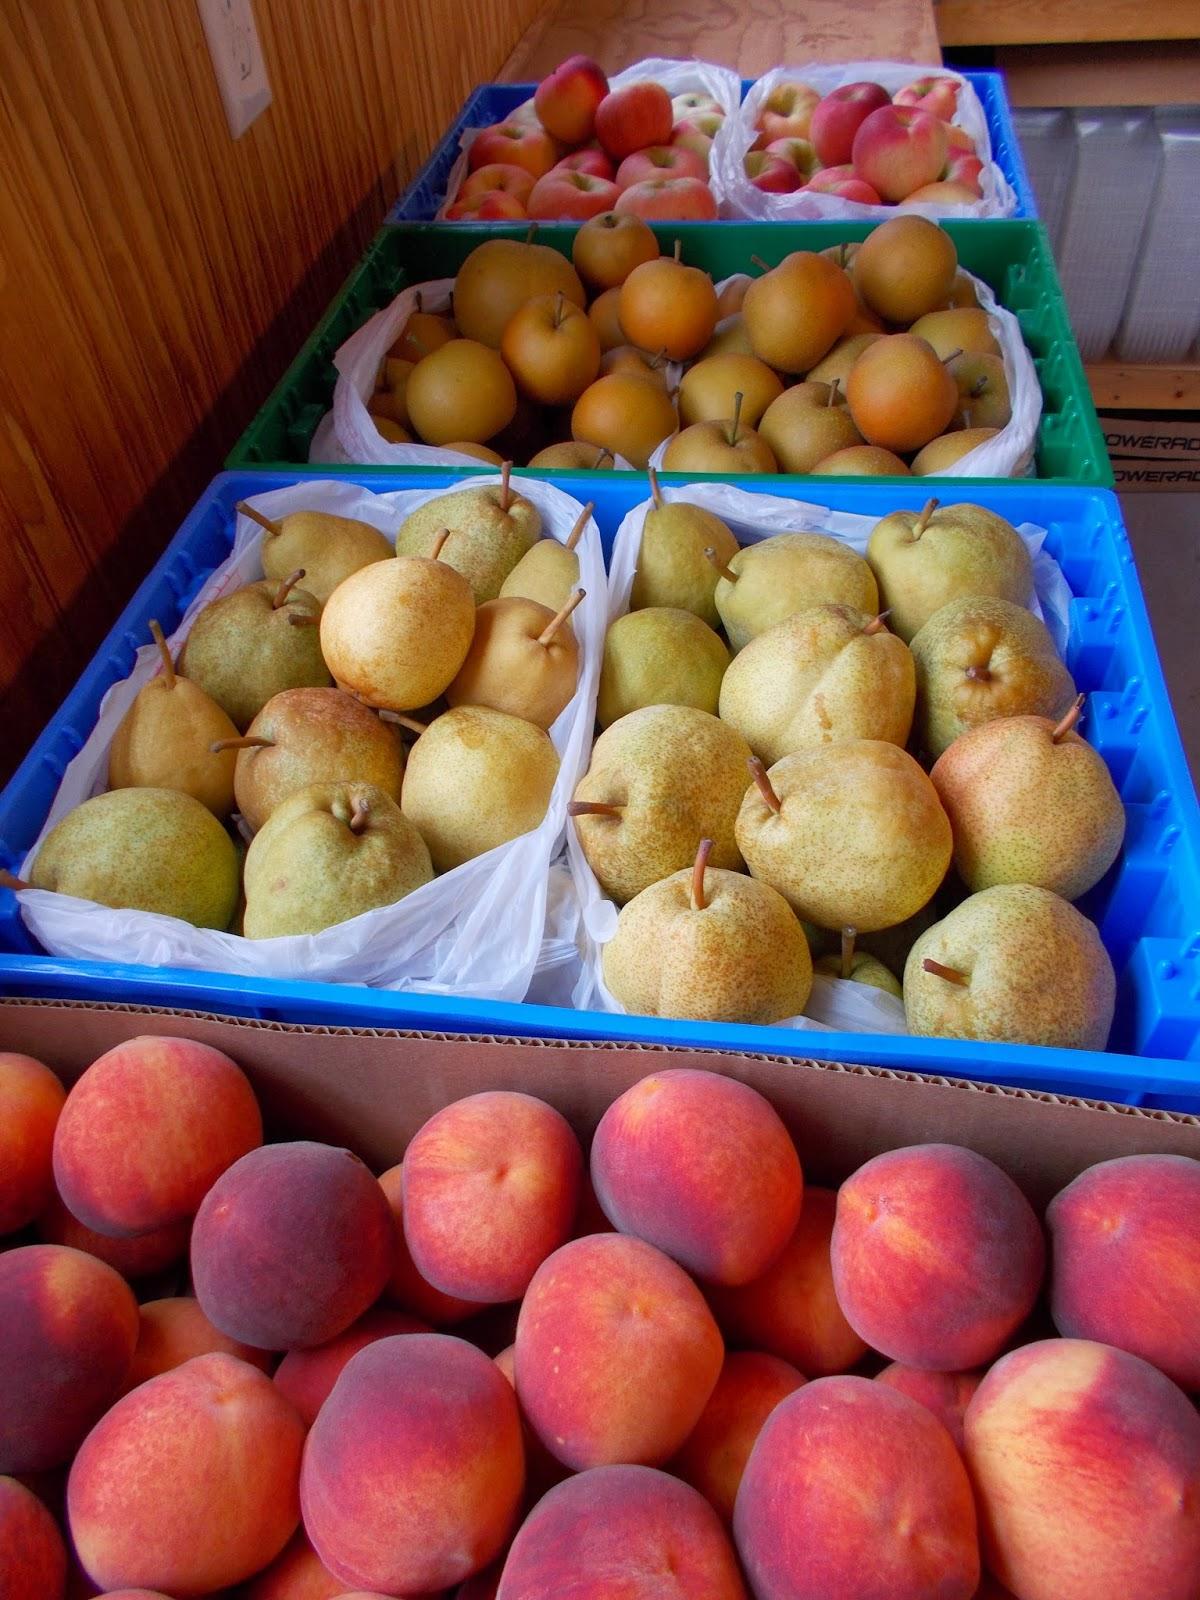 peach orchard asian personals 021513_corinth e-edition near the peach orchard manning & napier wrldoppa 820 -002 matthews asian china d 2403 +004 india d 1747 -010 merger merger.